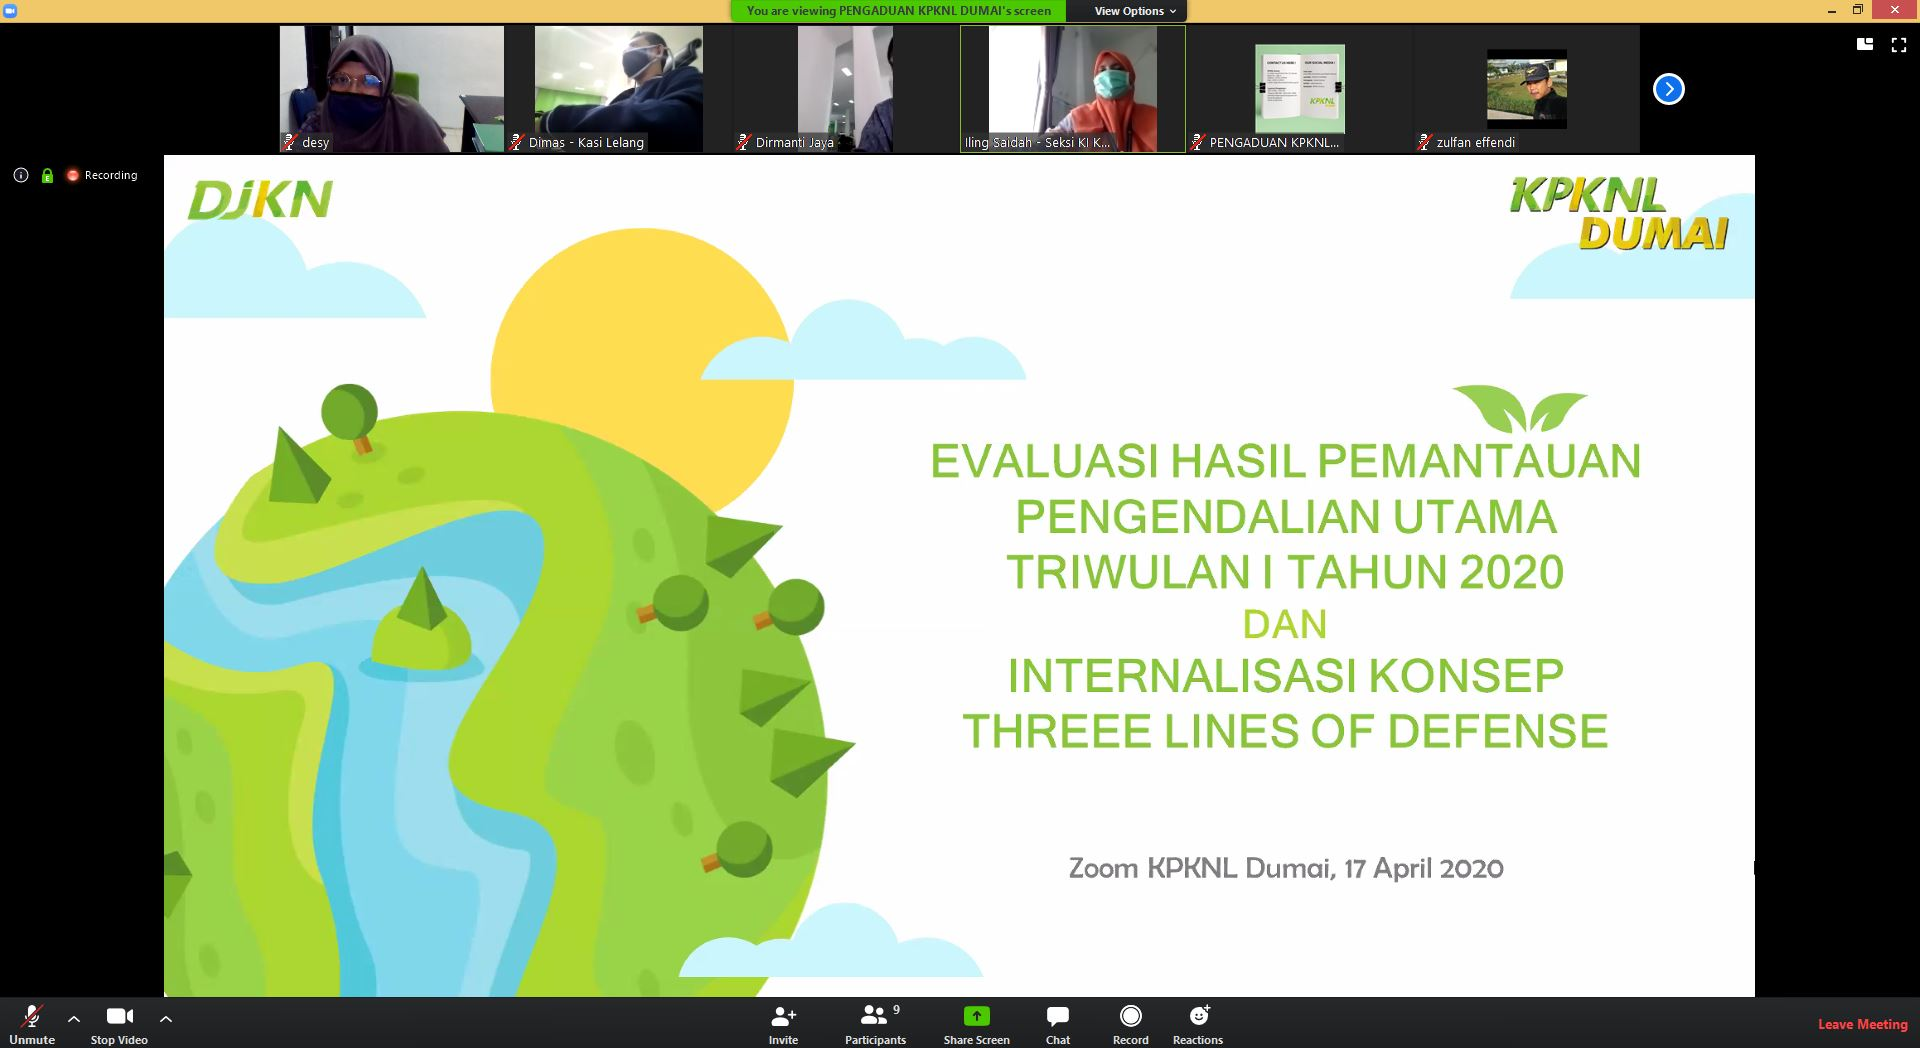 Berita DJKN KPKNL Dumai Laksanakan Rapat Evaluasi Hasil Pemantauan Pengendalian Utama Triwulan I Tahun 2020 Secara Online